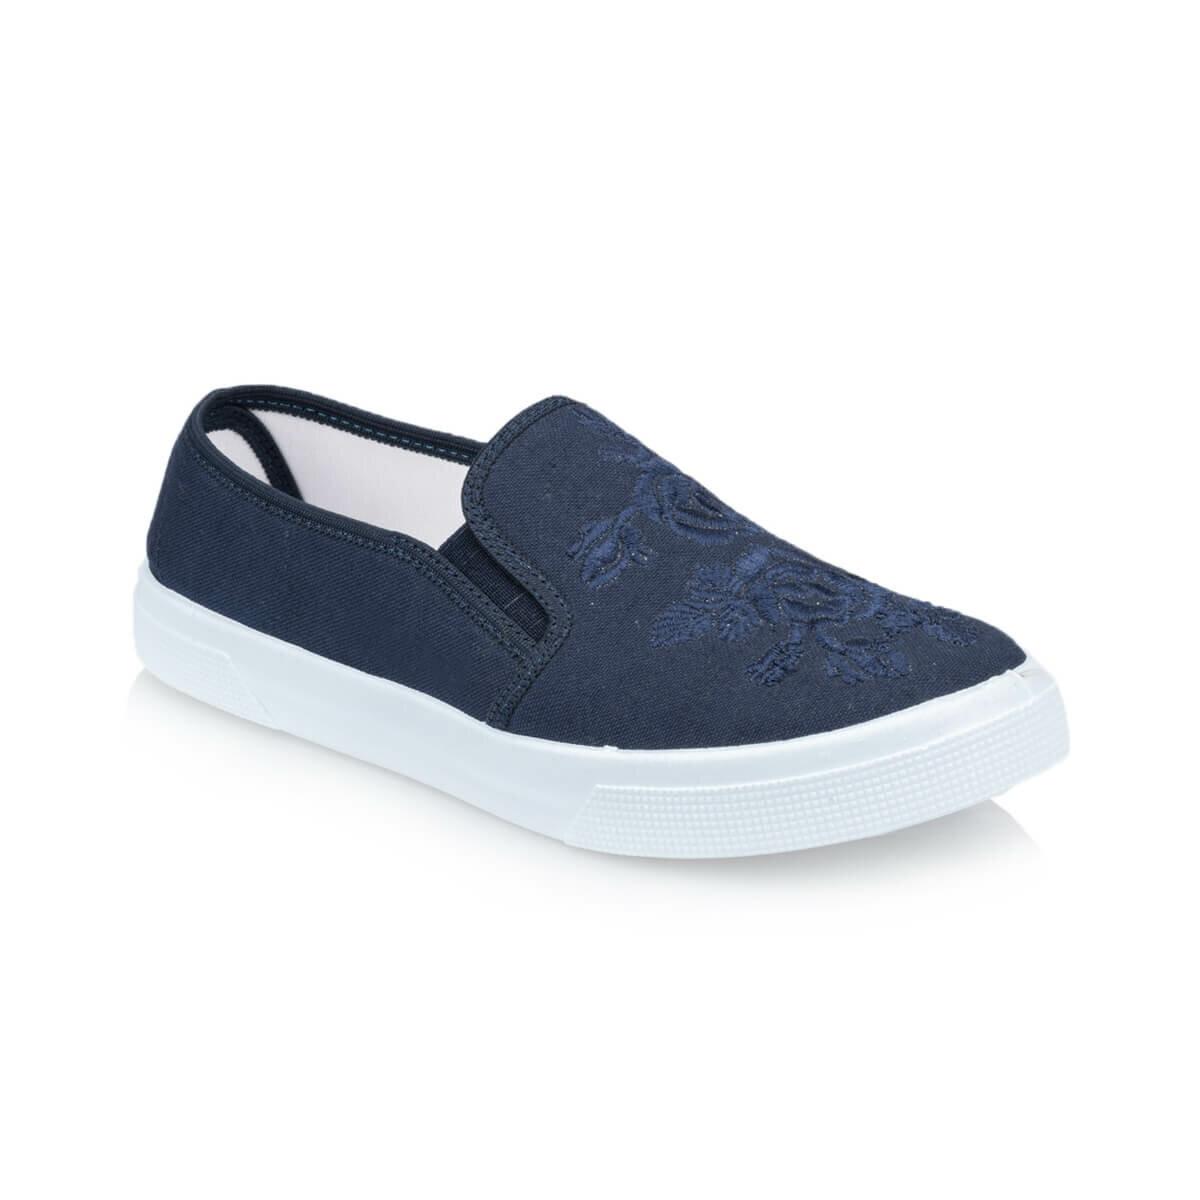 FLO 91.313427.Z Navy Blue Women 'S Slip On Shoes Polaris